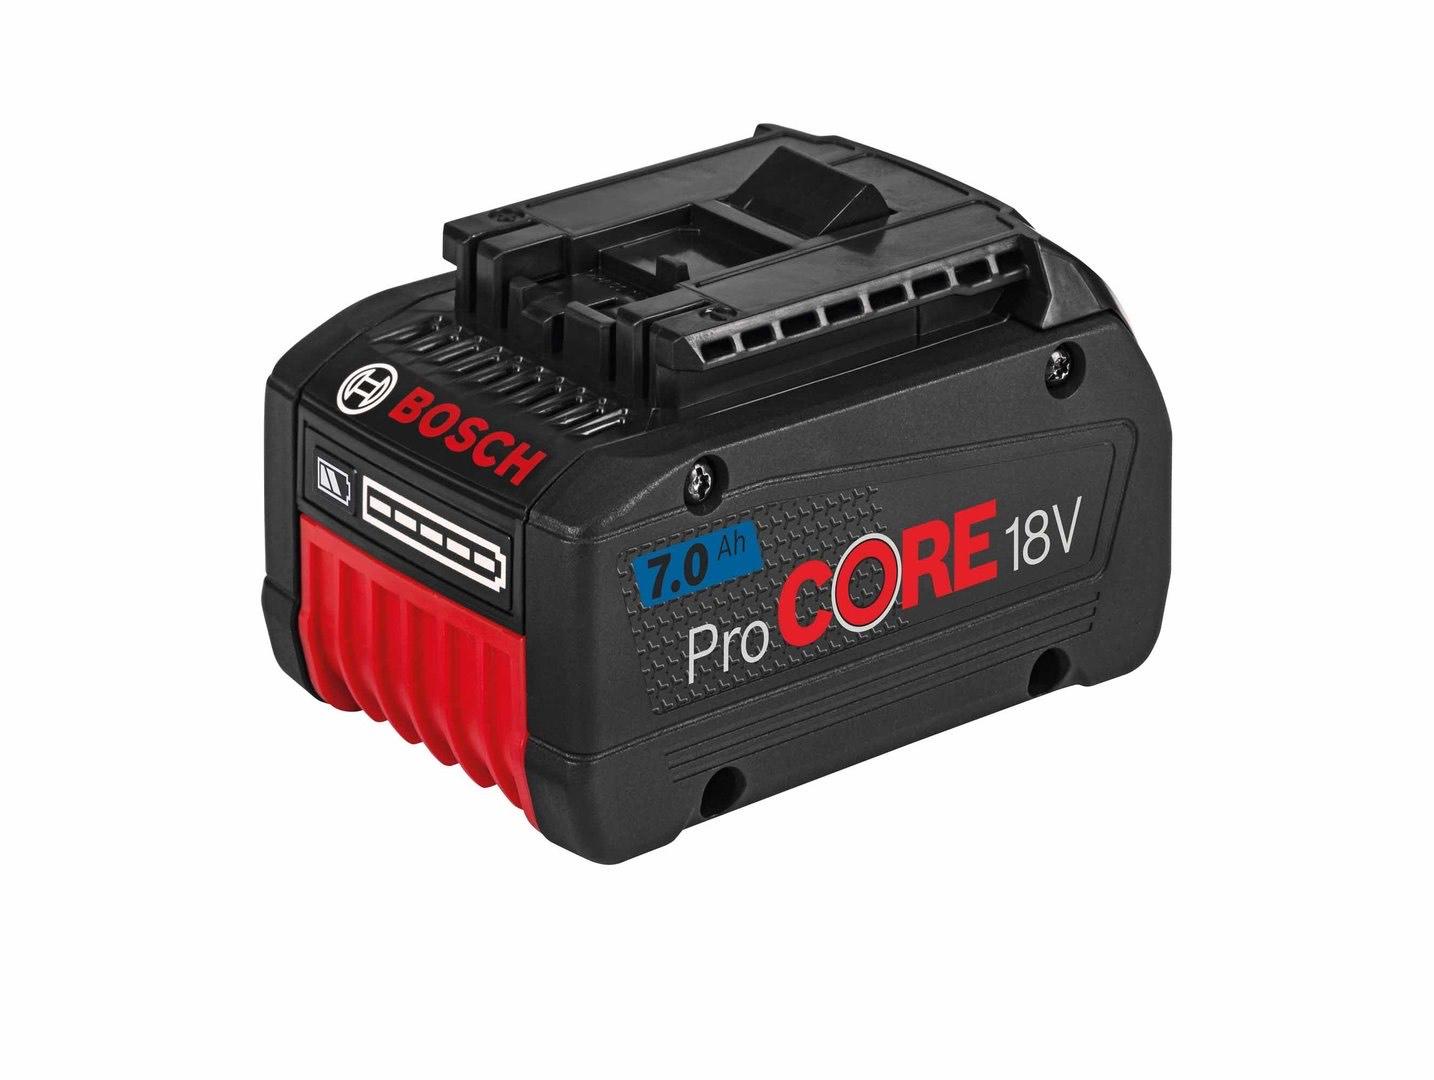 Bosch Professional Procore Pro Core Akku 7Ah 80€ - Mengenrabatt %